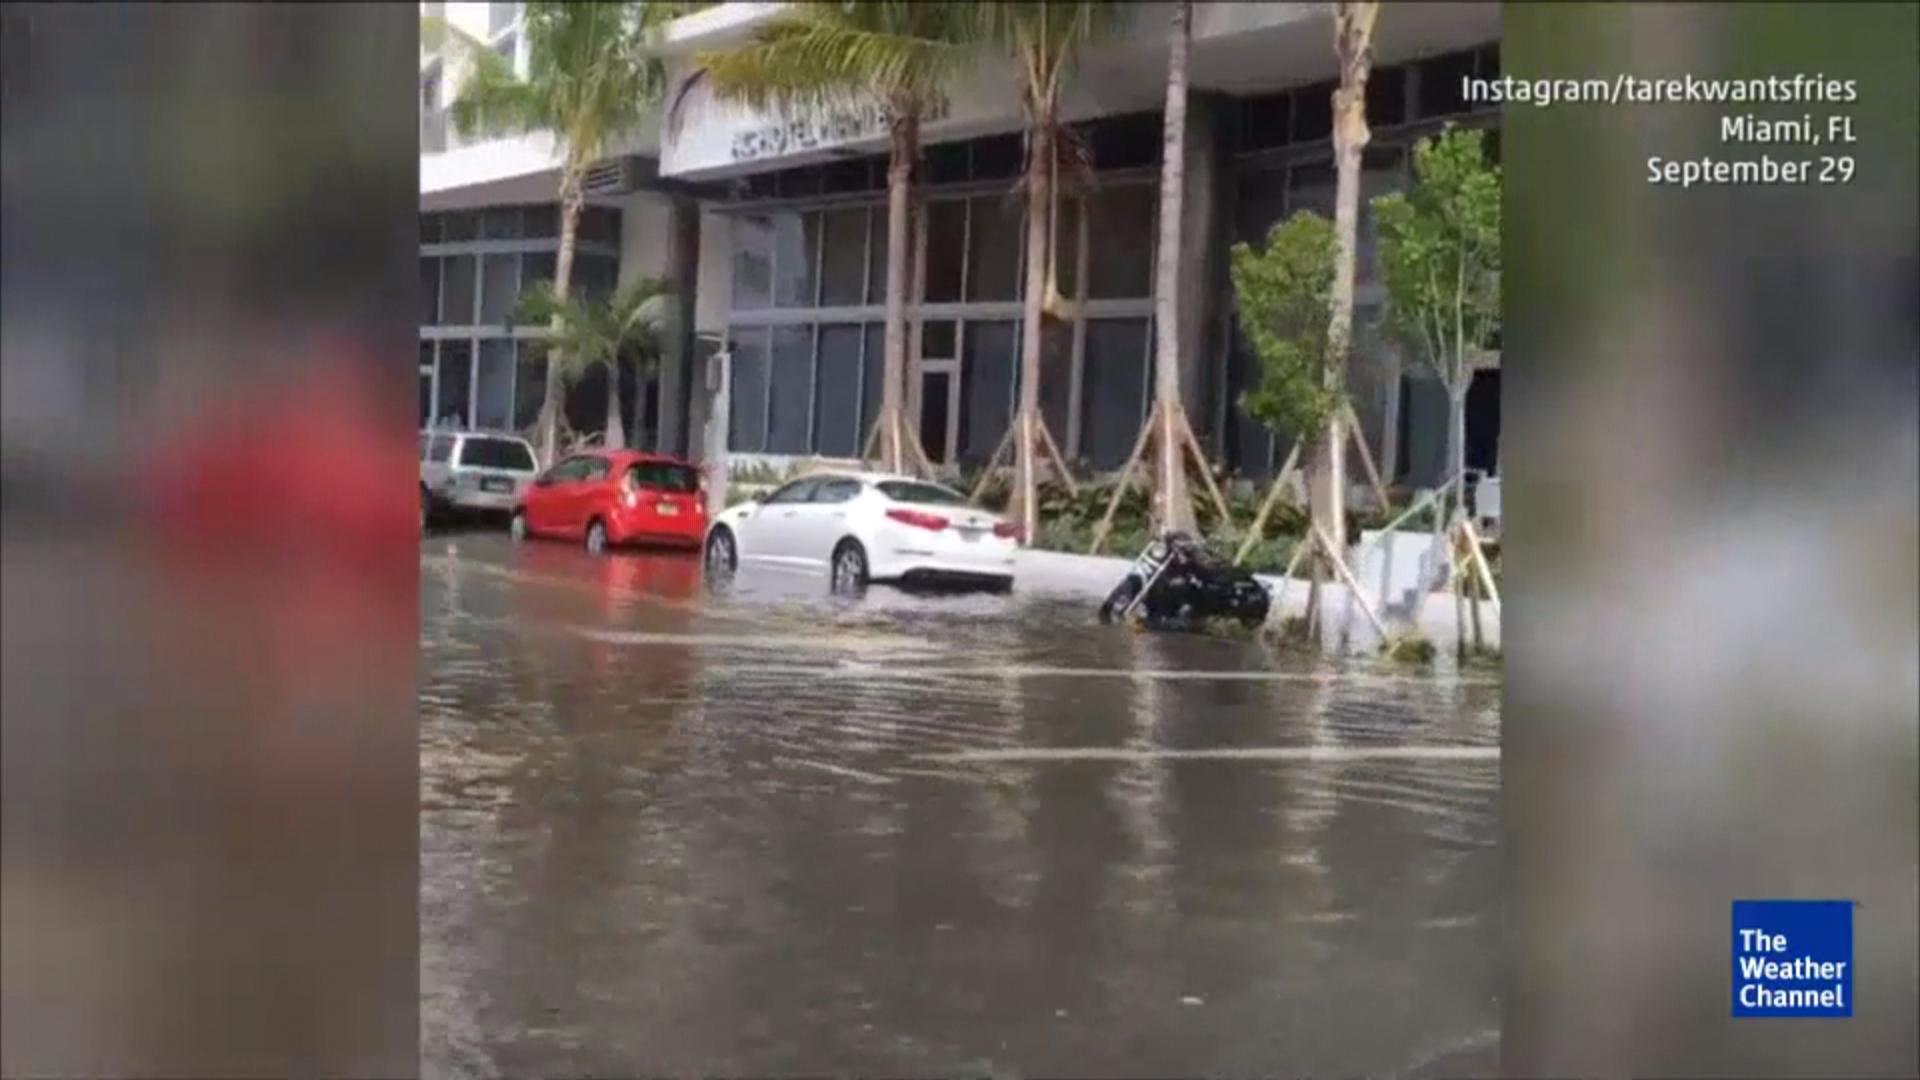 The Reason Urban Areas Are More Flood Prone Nbc News